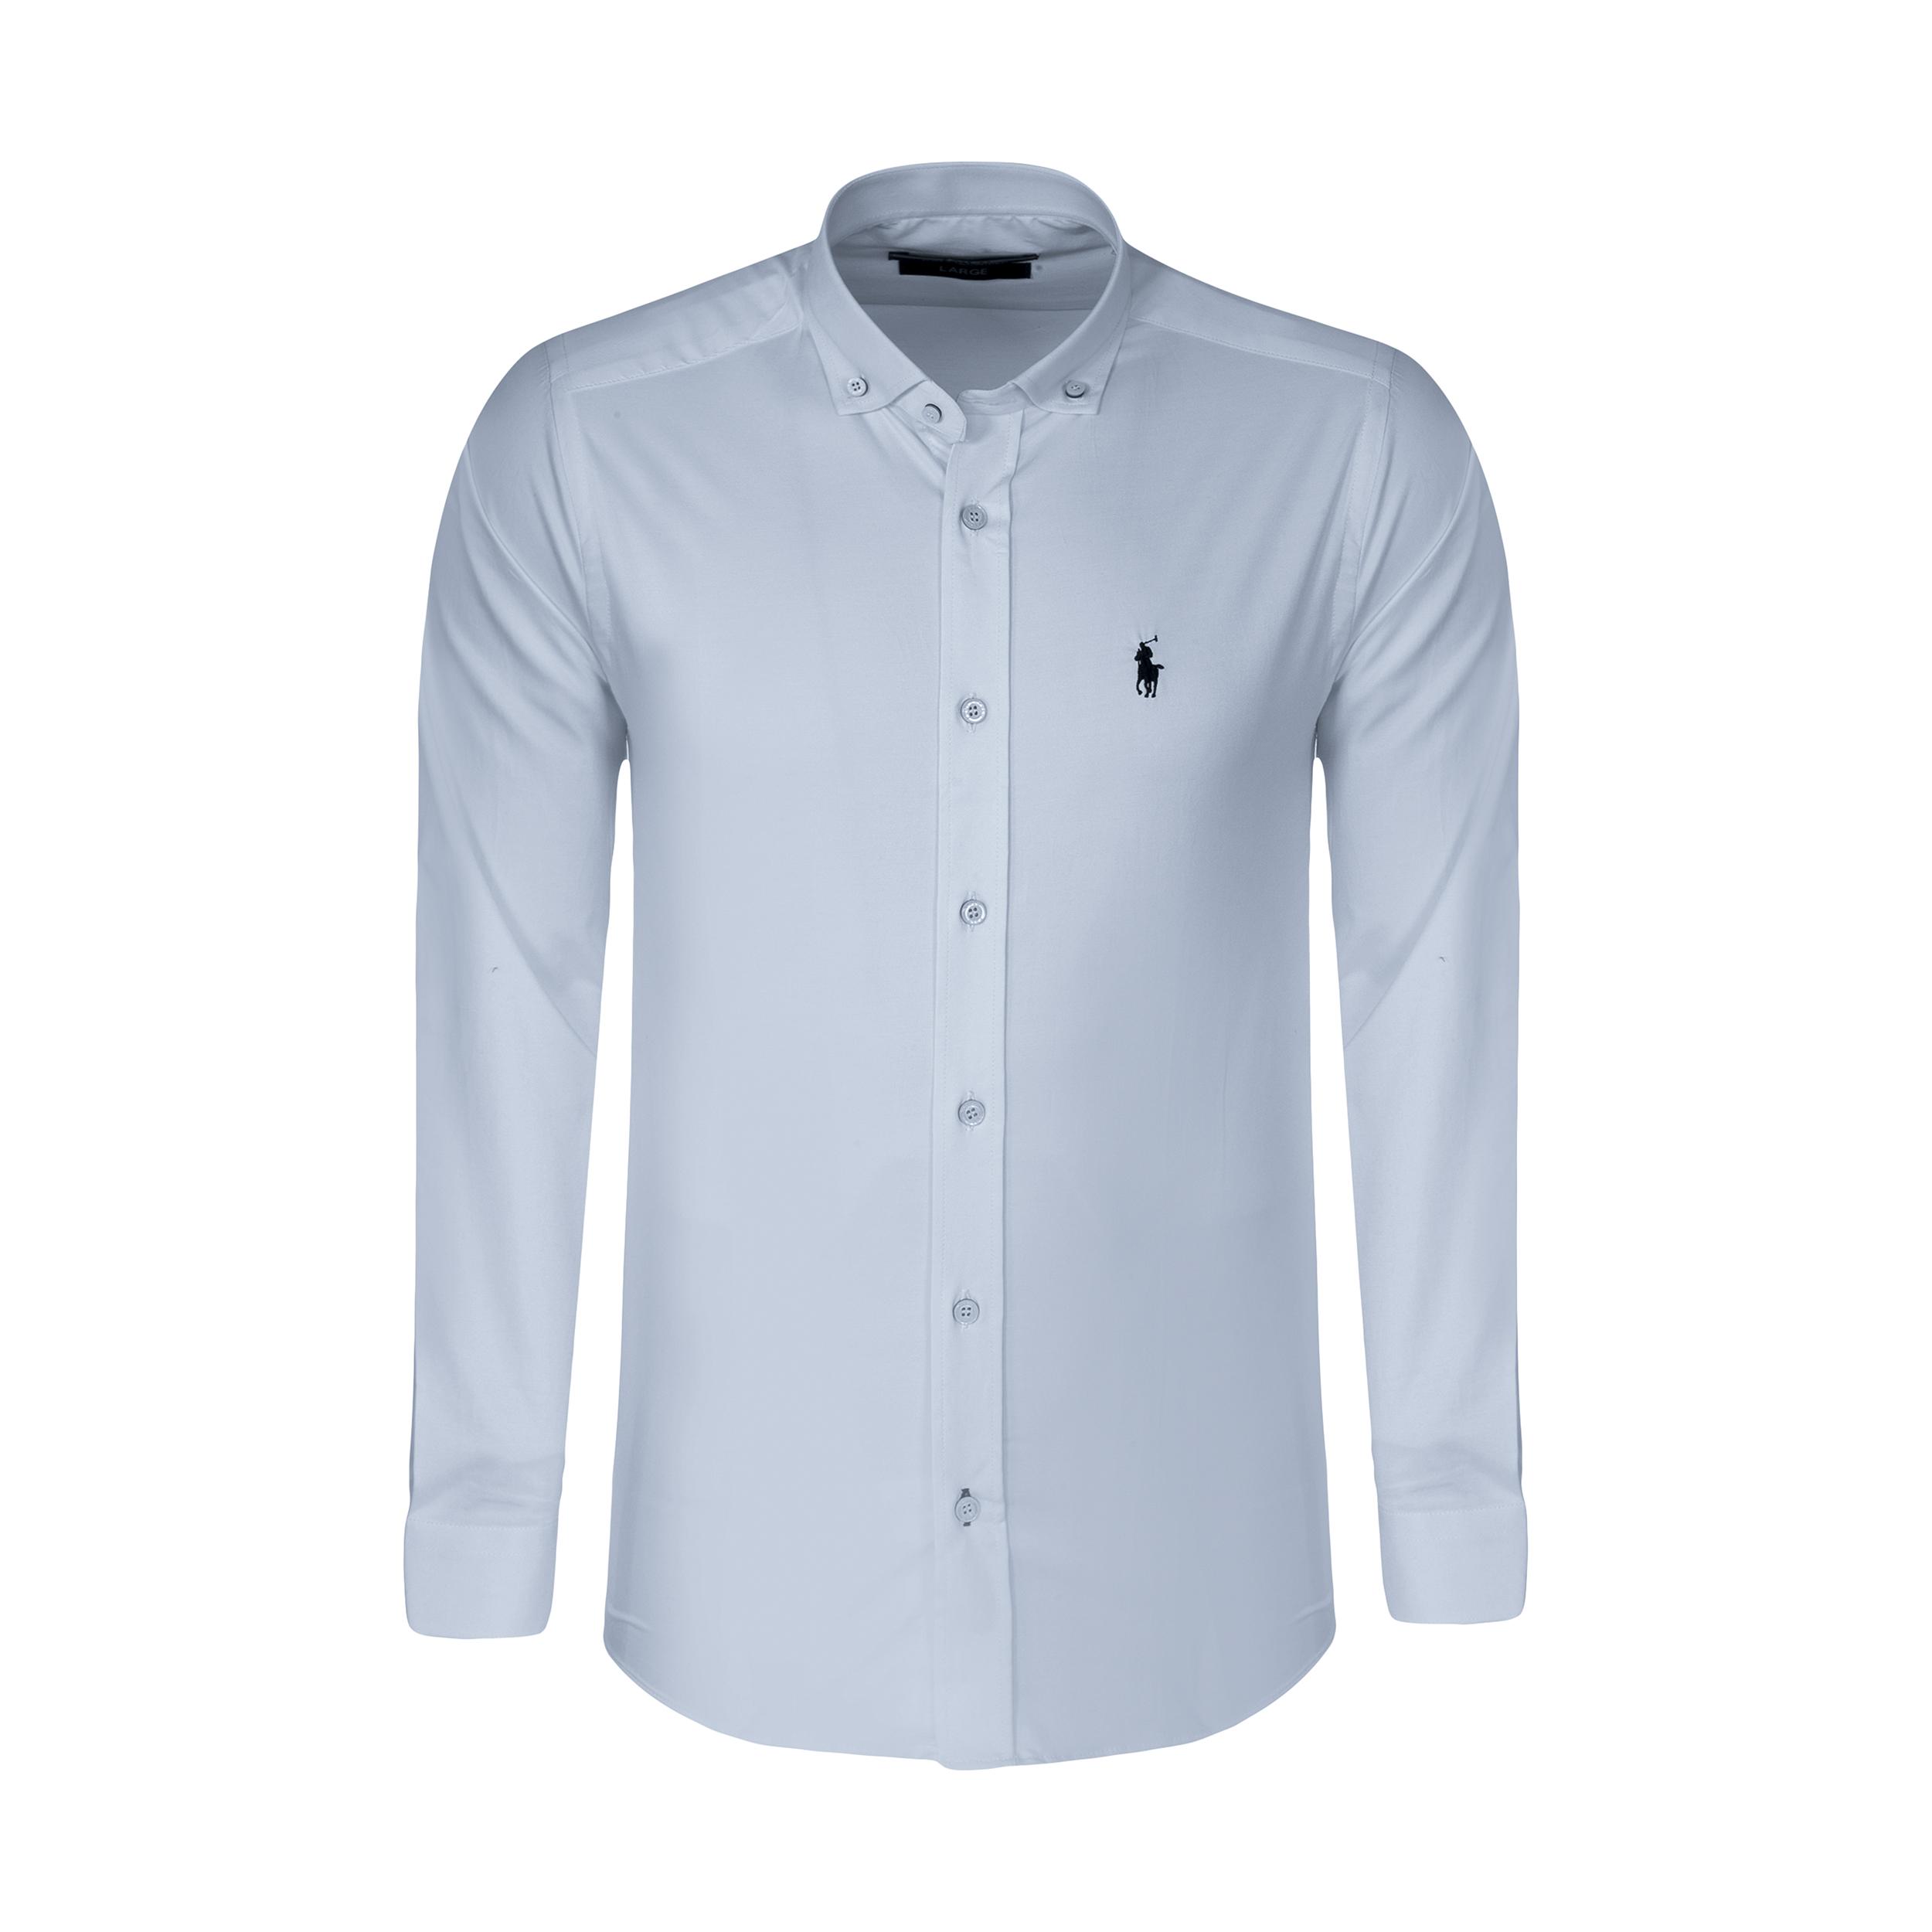 پیراهن آستین بلند مردانه پولو مدل MM010